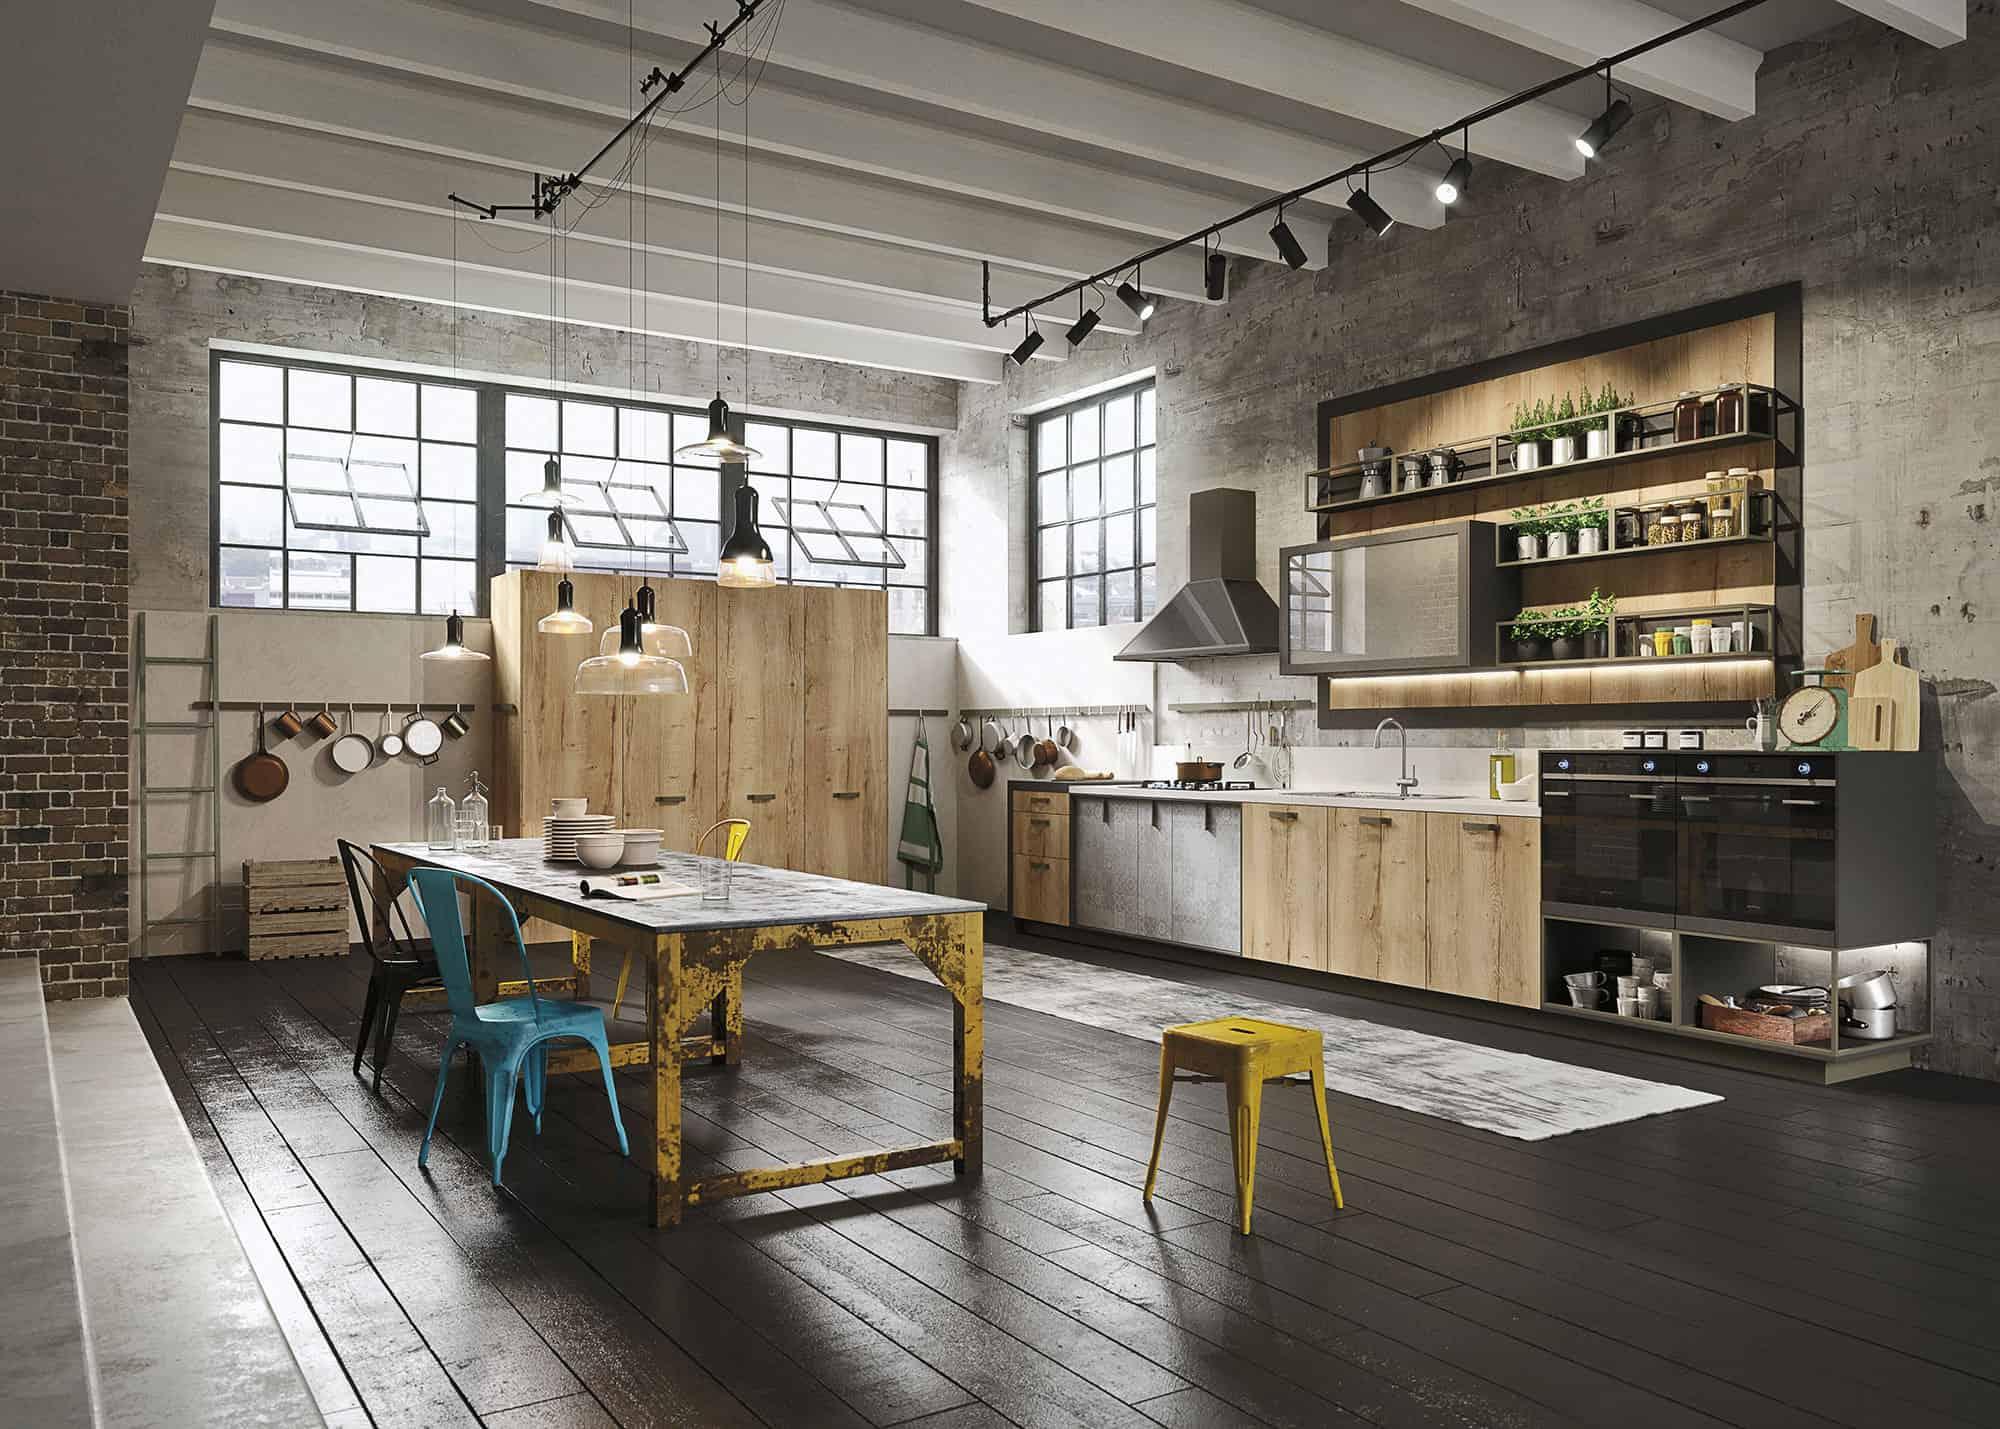 kitchen design lofts urban ideas snaidero kitchen design lofts trendy kitchen designs trend home design decor